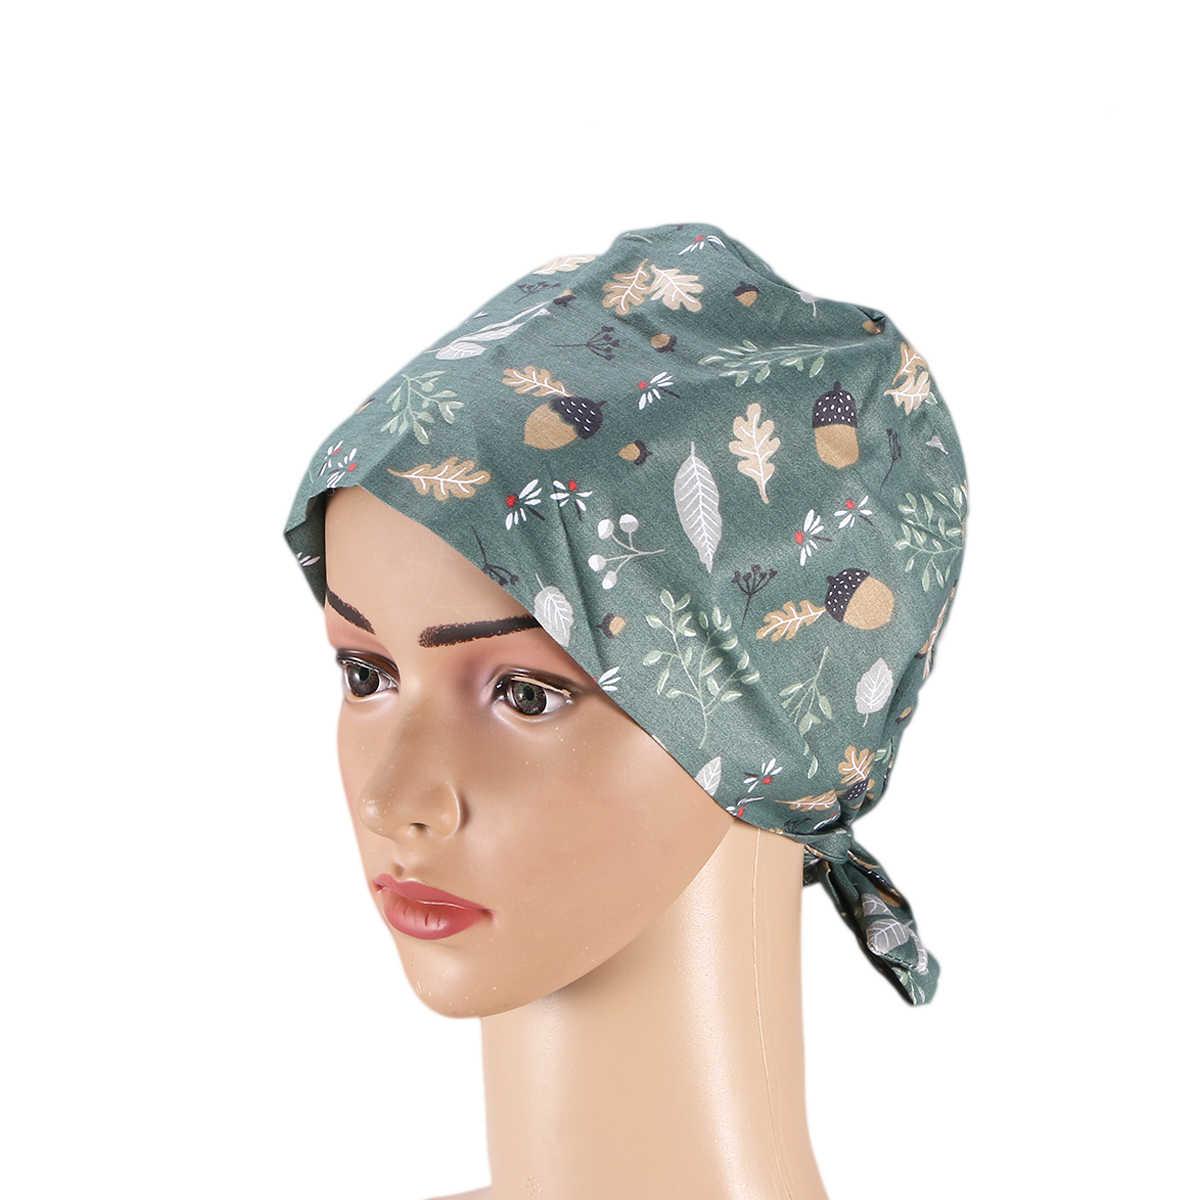 1pc หมวกผ่าตัดผ้าฝ้าย Dragonfly พิมพ์ Unisex ศัลยกรรมหมวกปรับหมวกหมวกพยาบาลสำหรับพยาบาลแพทย์เภสัชกร